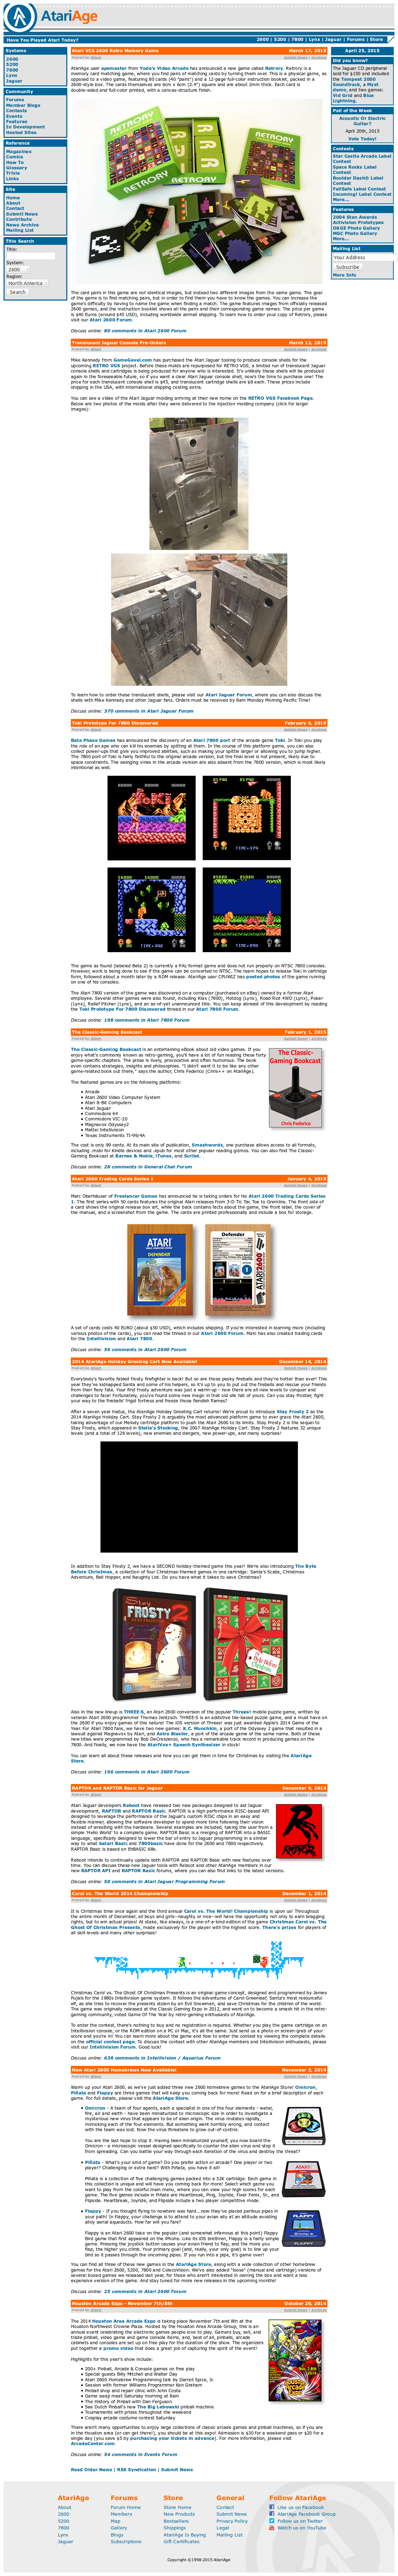 Screenshot of website AtariAge